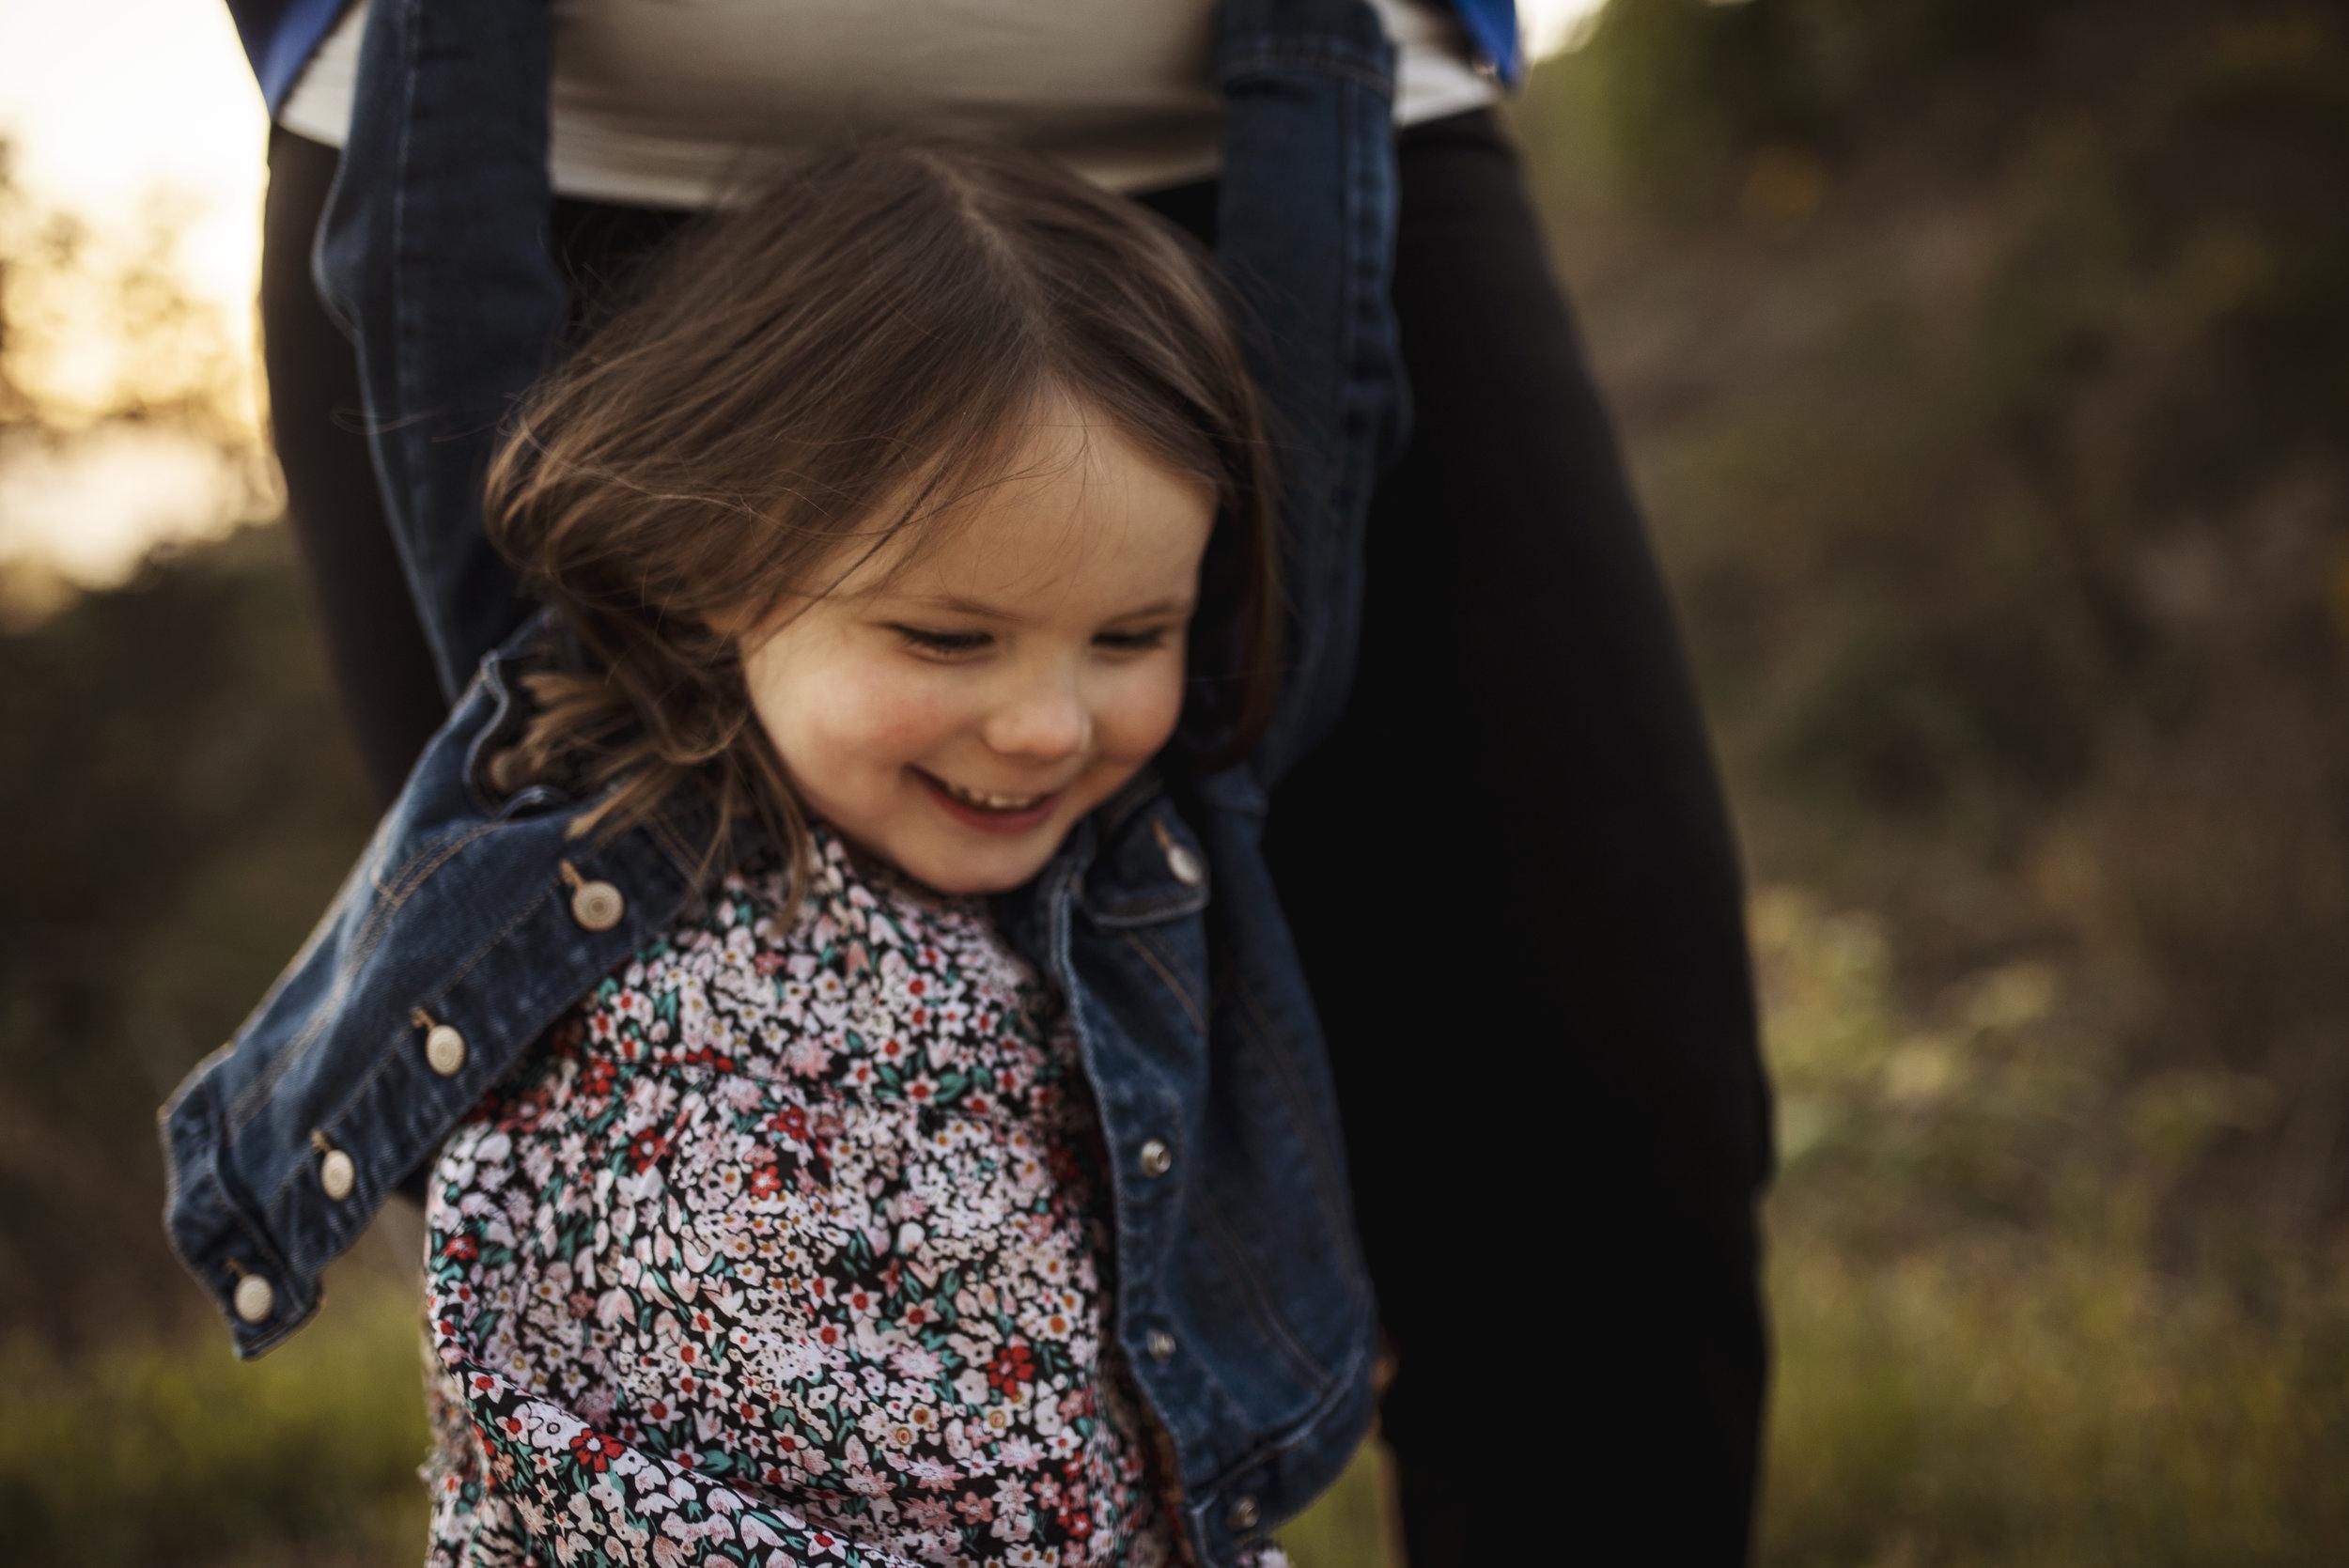 Lifestyle photographer Everett mom is swinging daughter